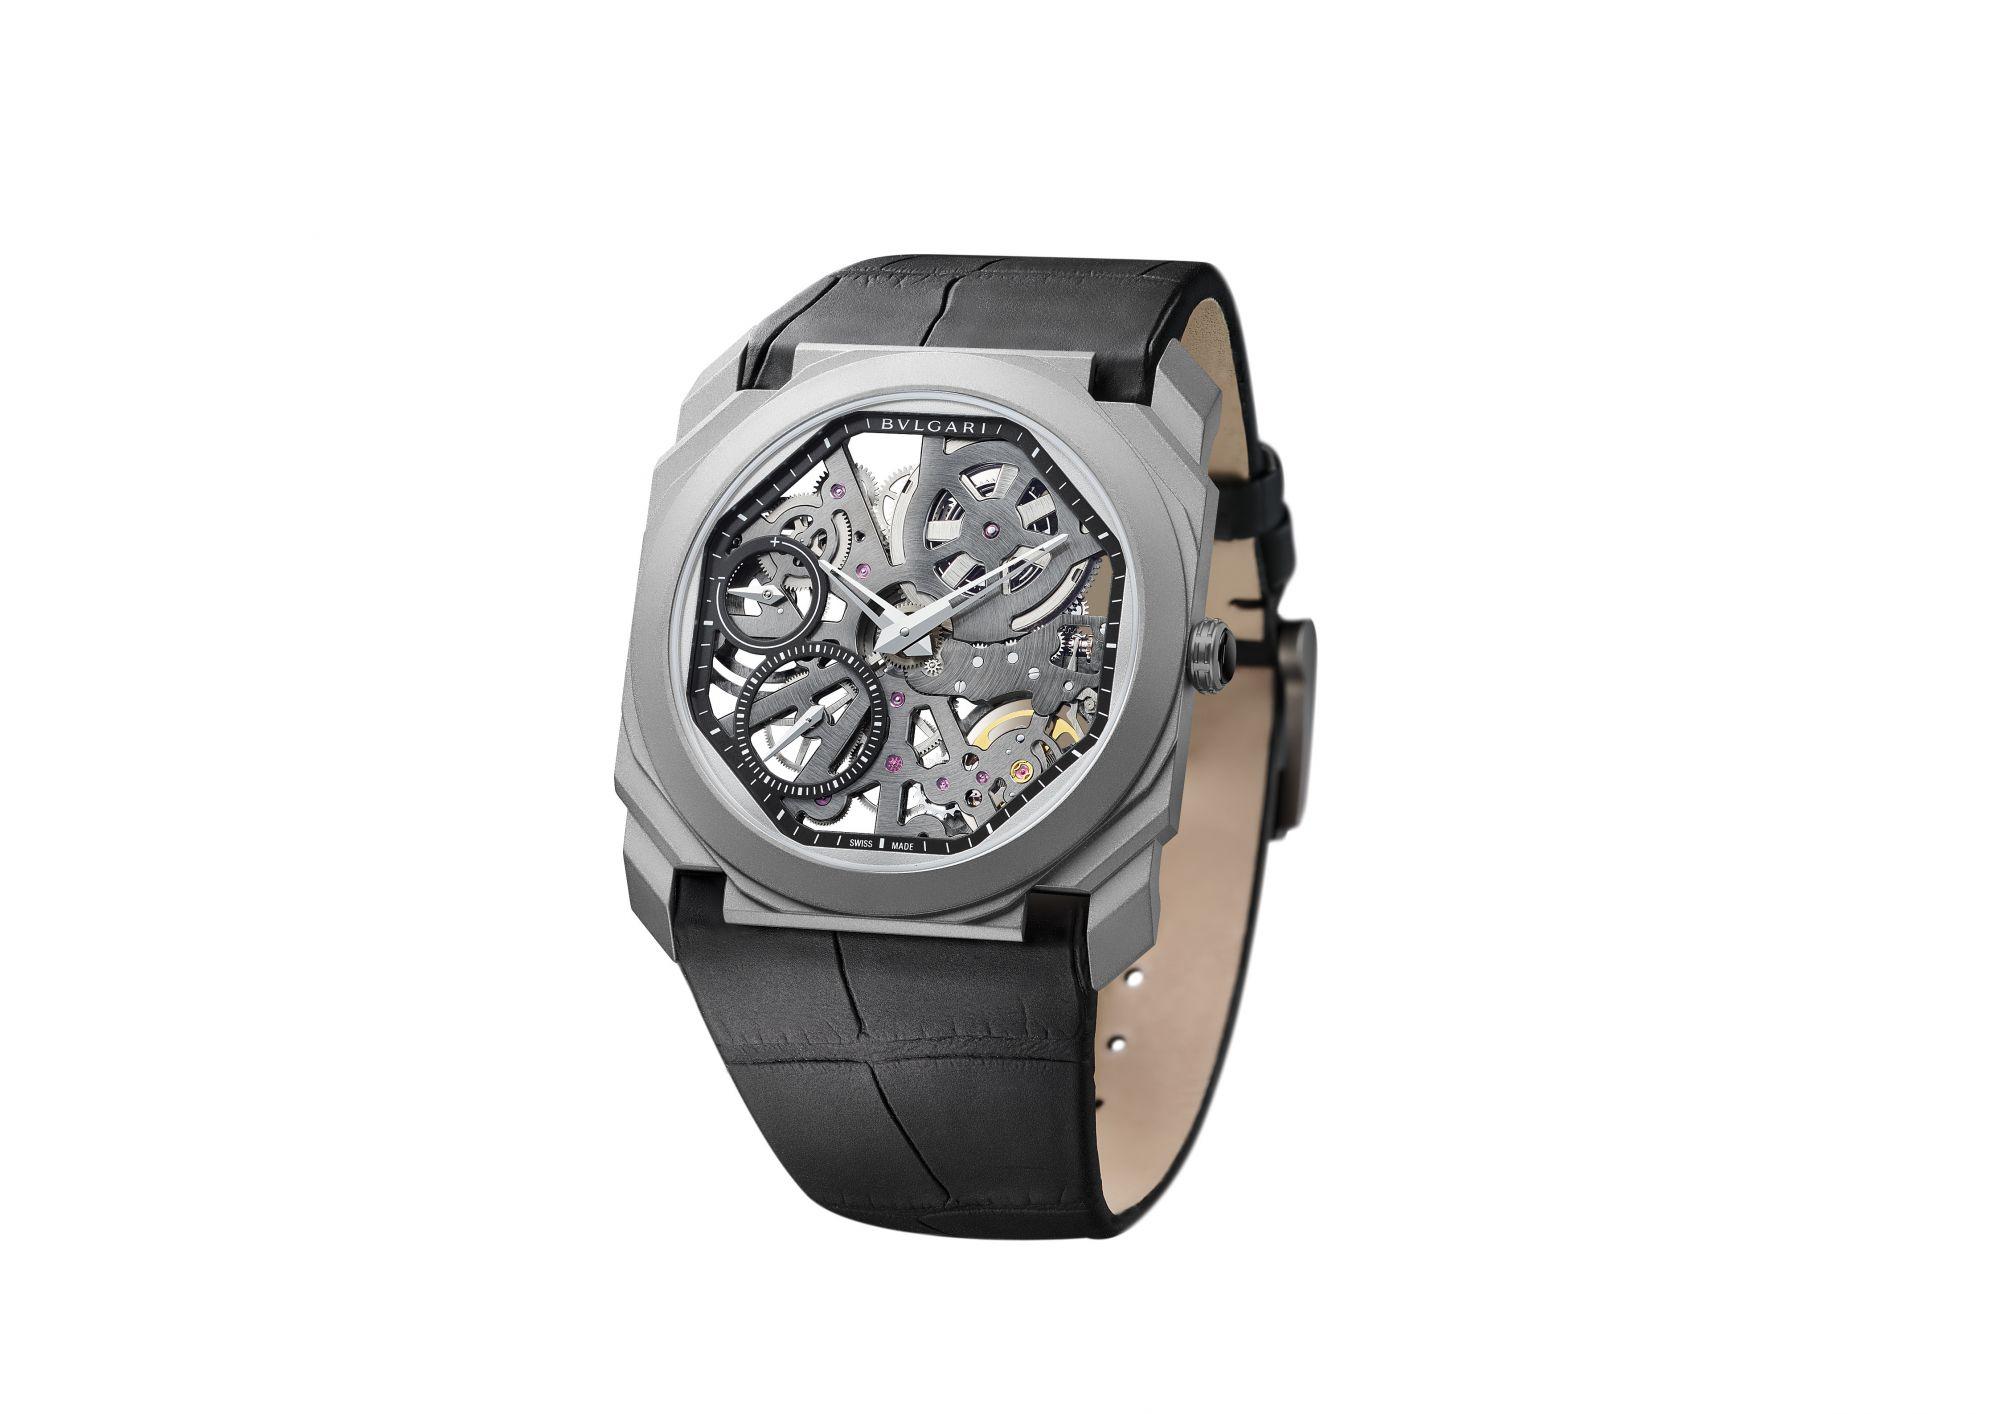 Bulgari OCTO FINISSIMO SKELETON 超薄鏤空腕錶